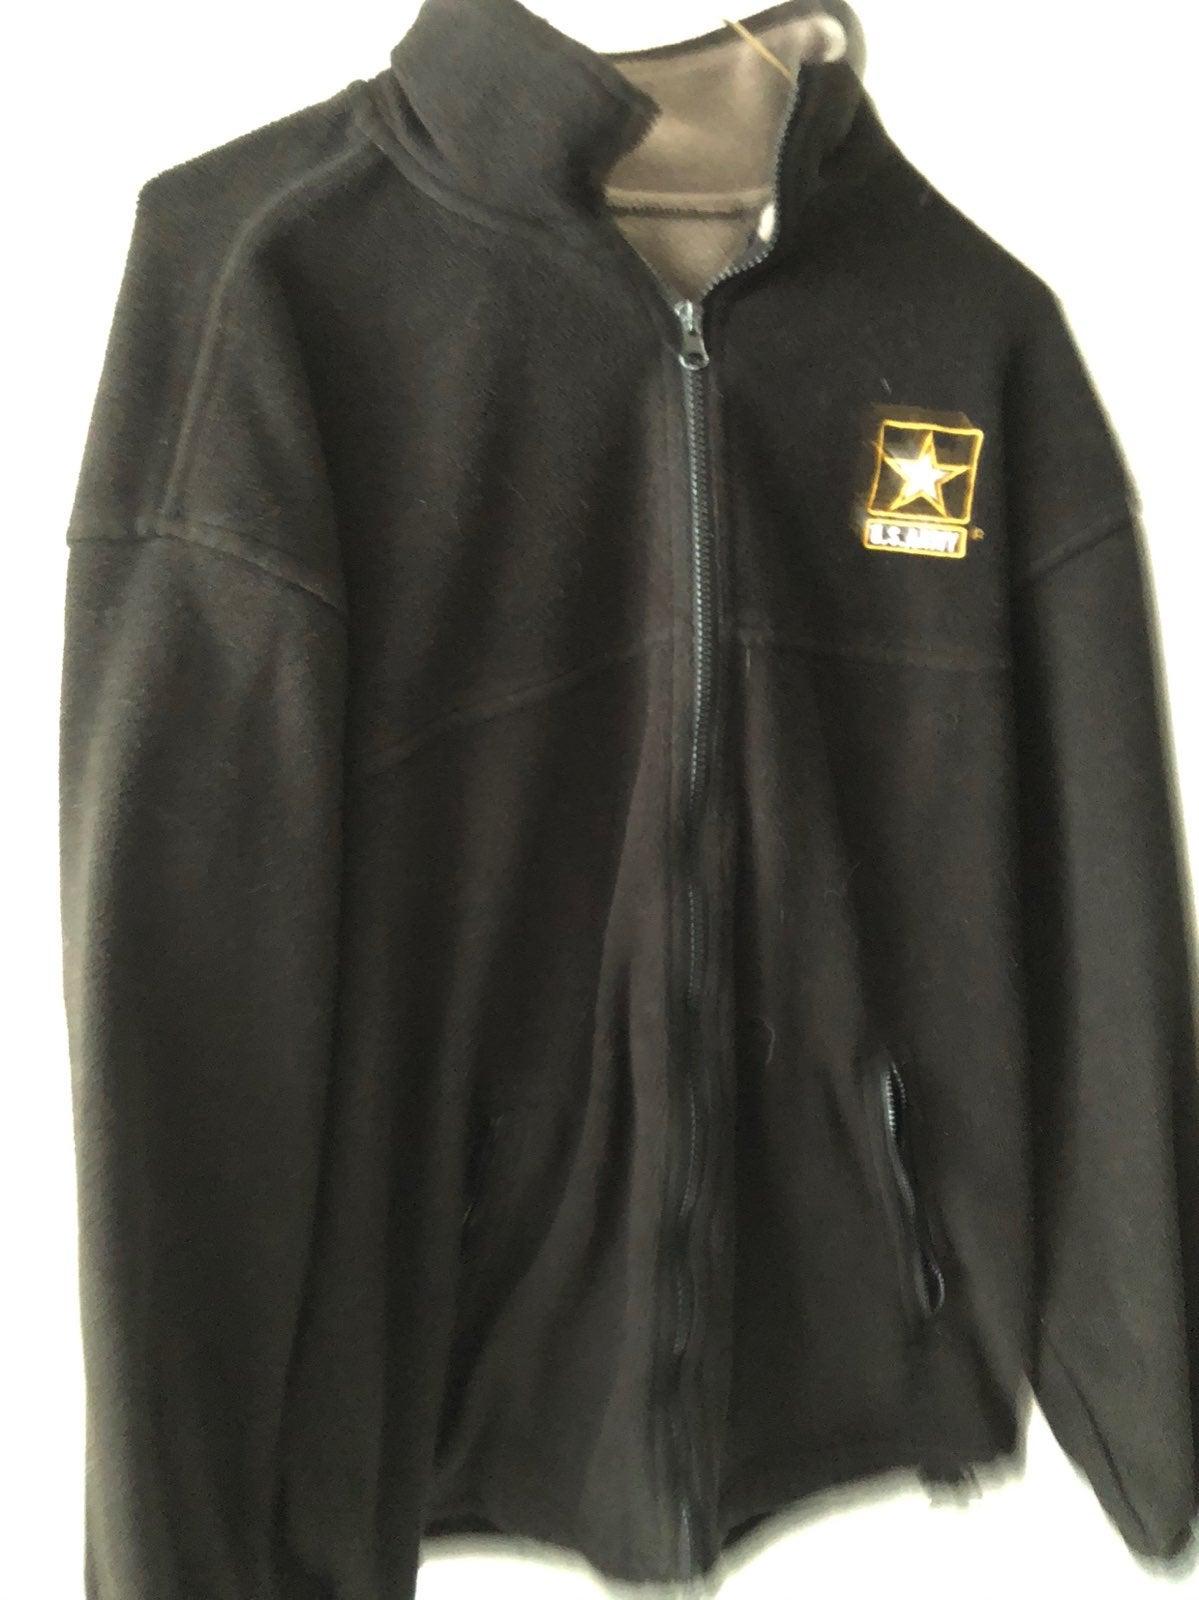 Men's Size Small US Army Black Fleece